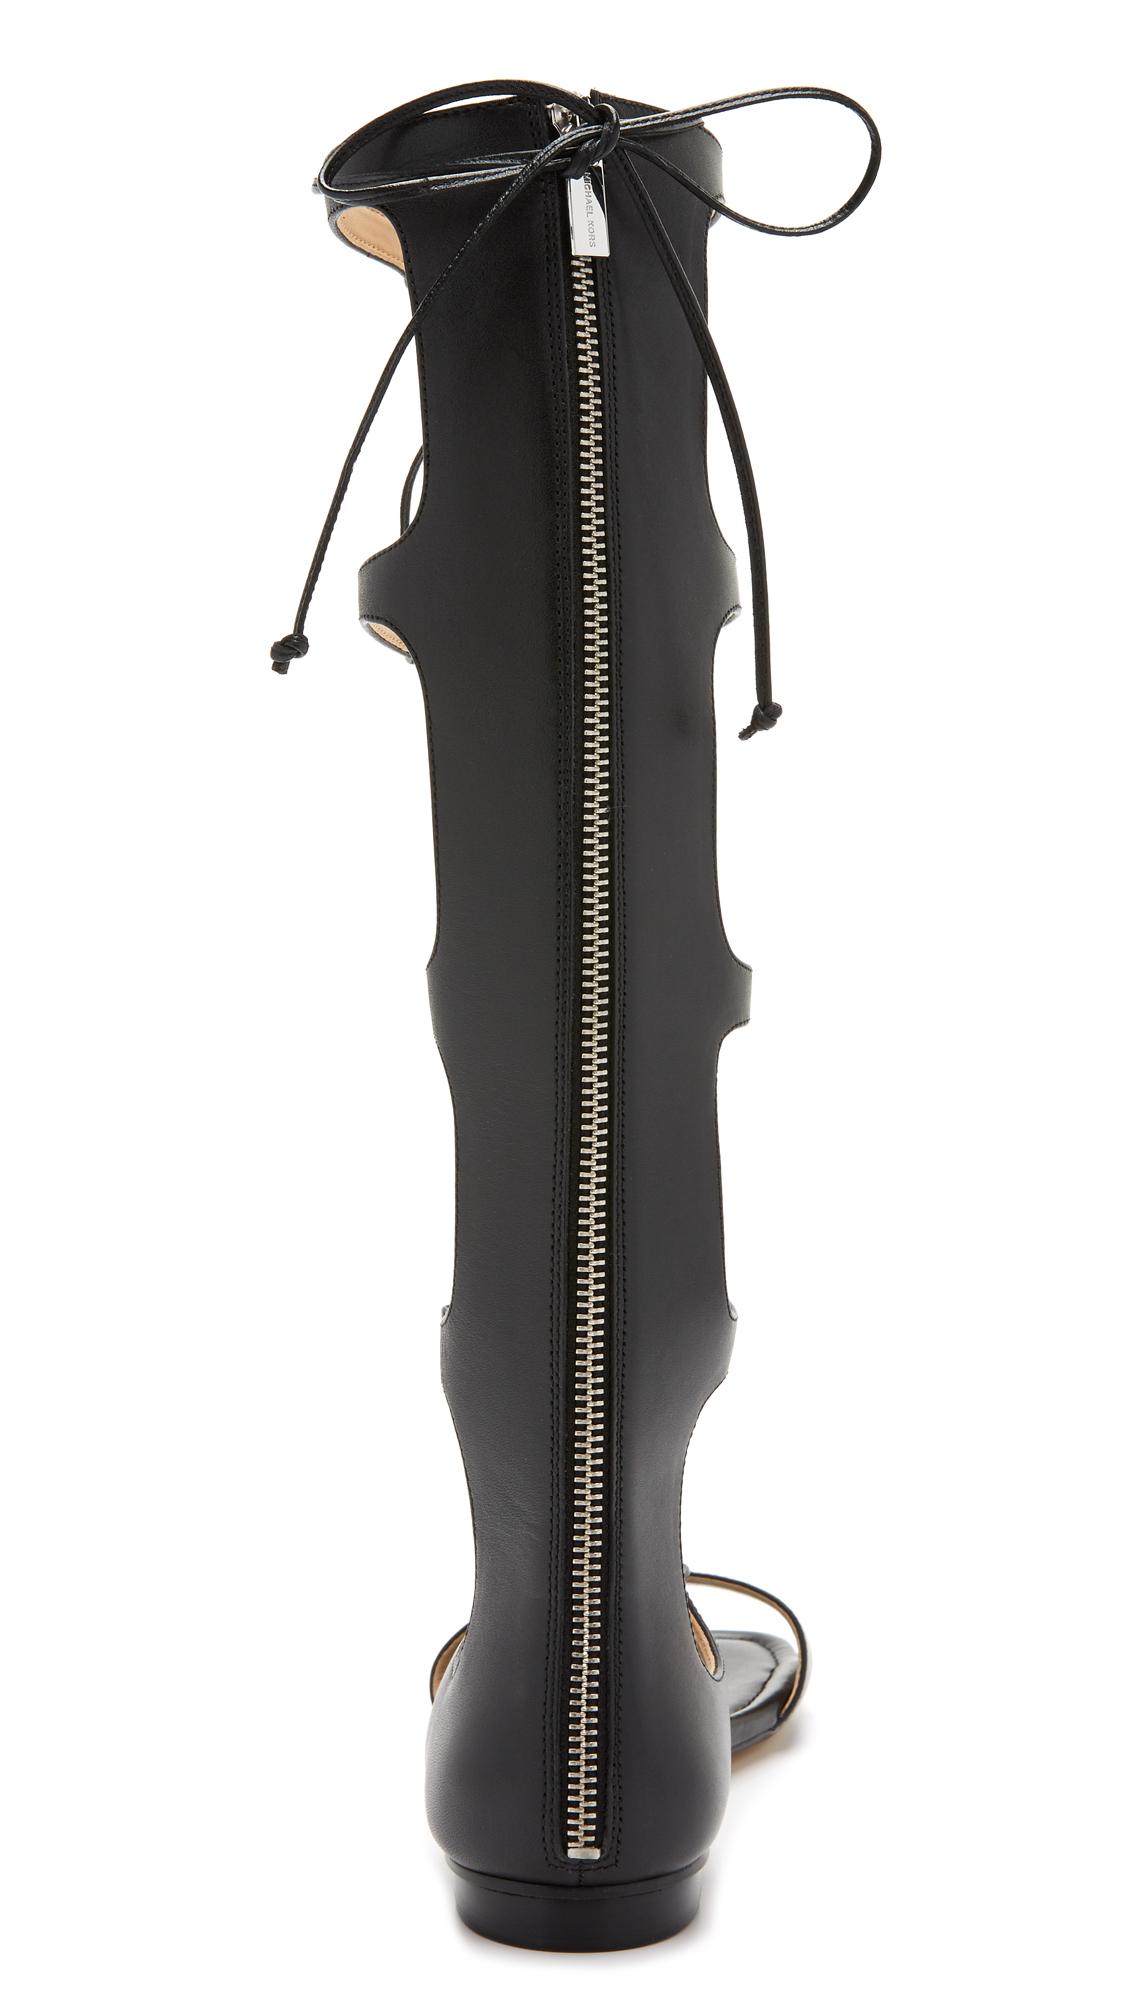 1c91293069bc7 Ugg Goddess Gladiator Sandals